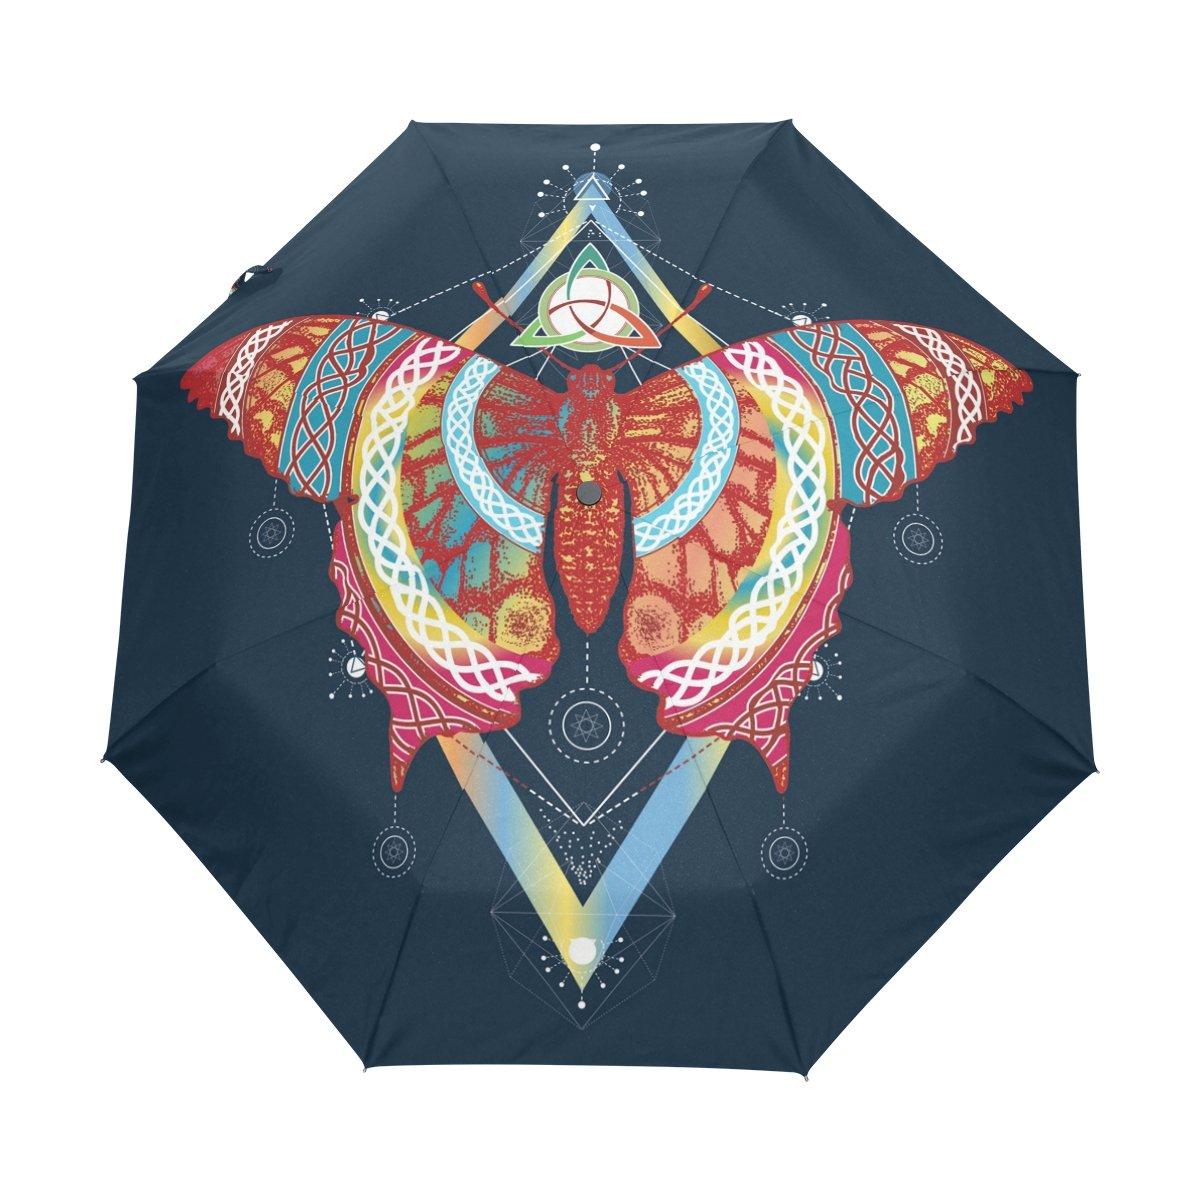 Senya Saobao防風と防雨トラベル傘with自動開いて閉じFoldingバタフライポータブル折りたたみ式太陽雨傘 B07FF21Q91